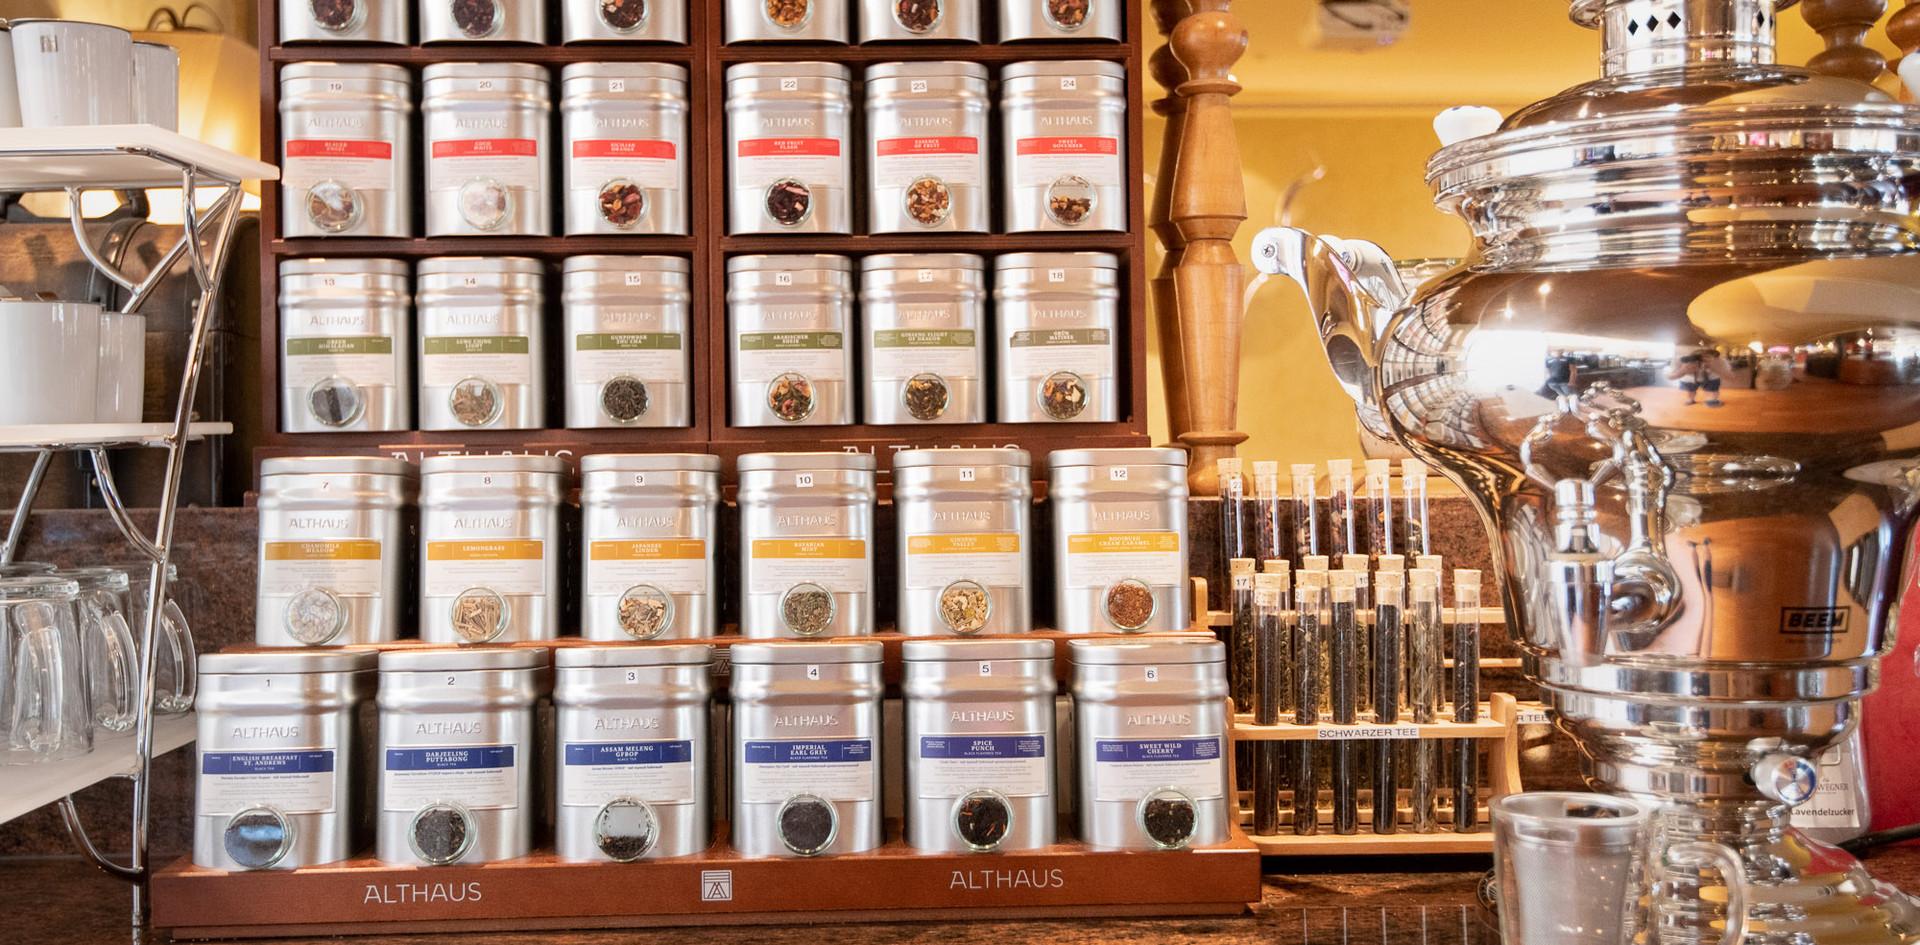 Teeauswahl Althaus Tee Afternoon Tea - Hotel Wegner - The culinary Art Hotel